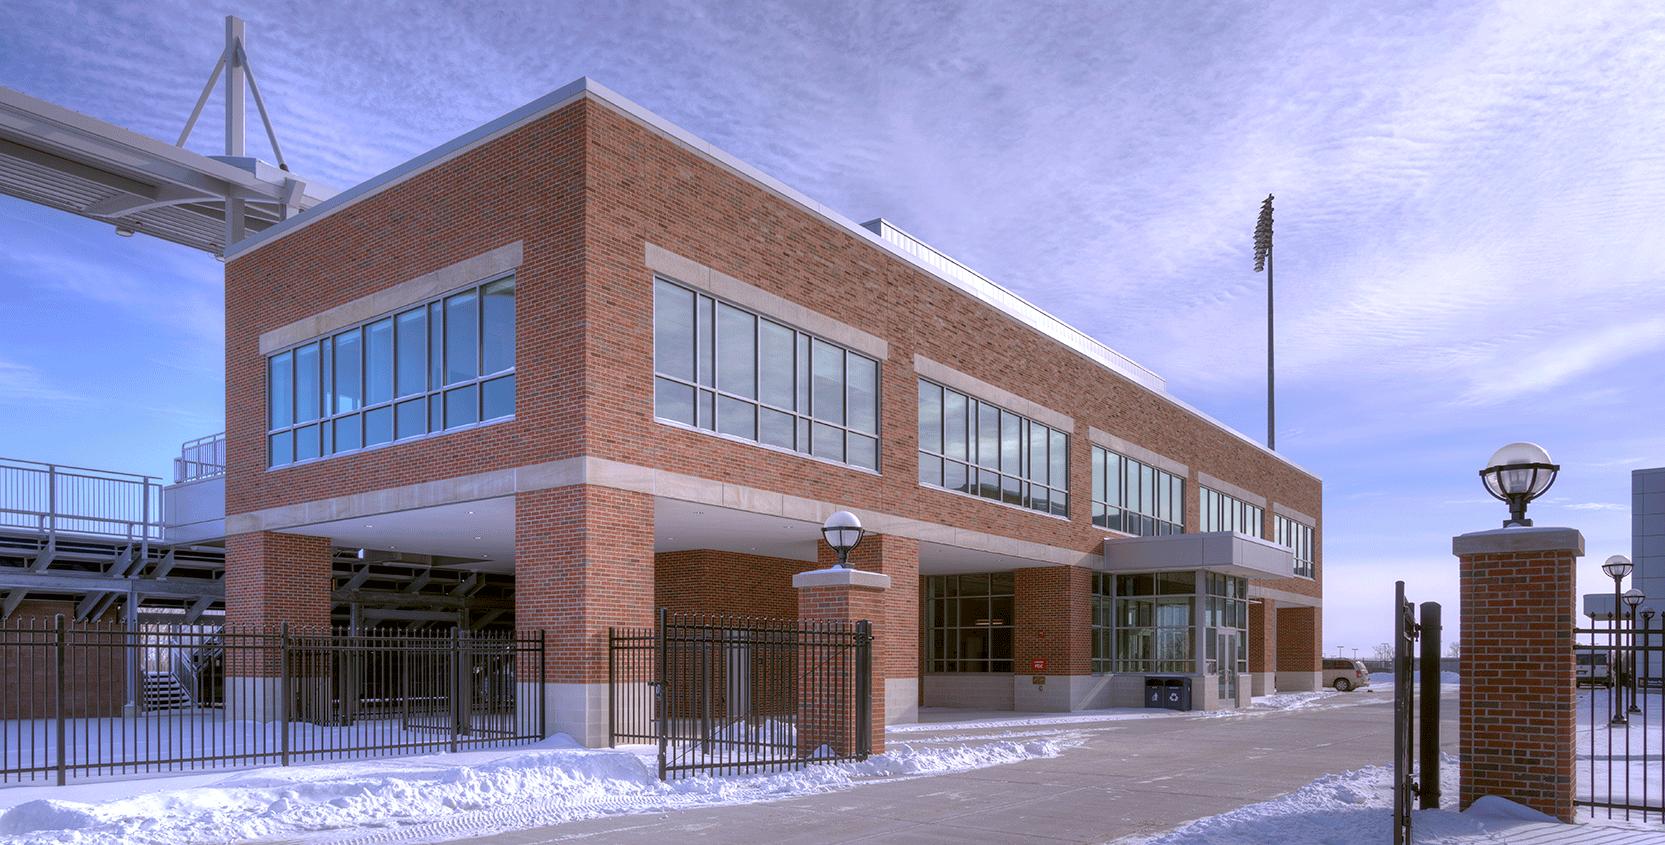 University-of-Michigan-ASCP-Exterior-1665x845